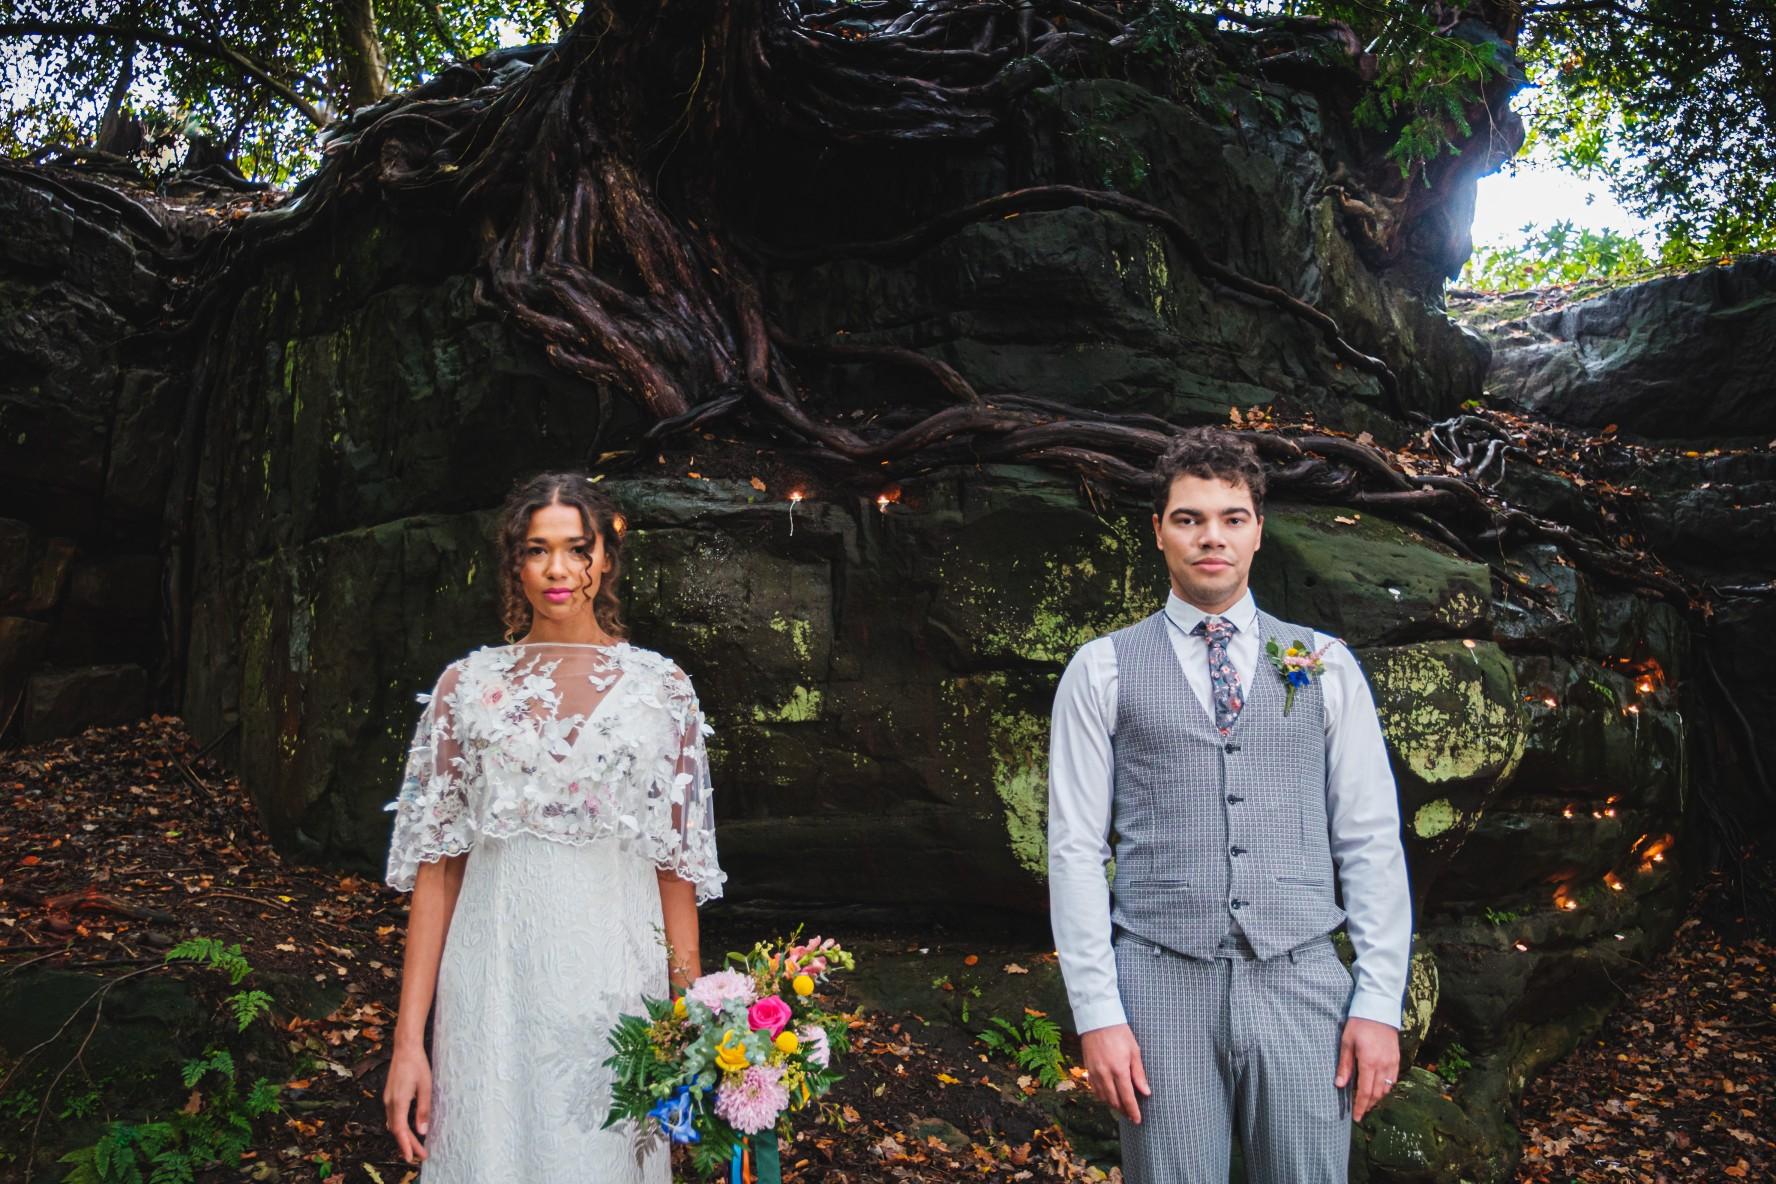 colourful micro wedding at patricks barn - unique wedding venue - sussex wedding venue - small wedding inspiration - unconventional wedding